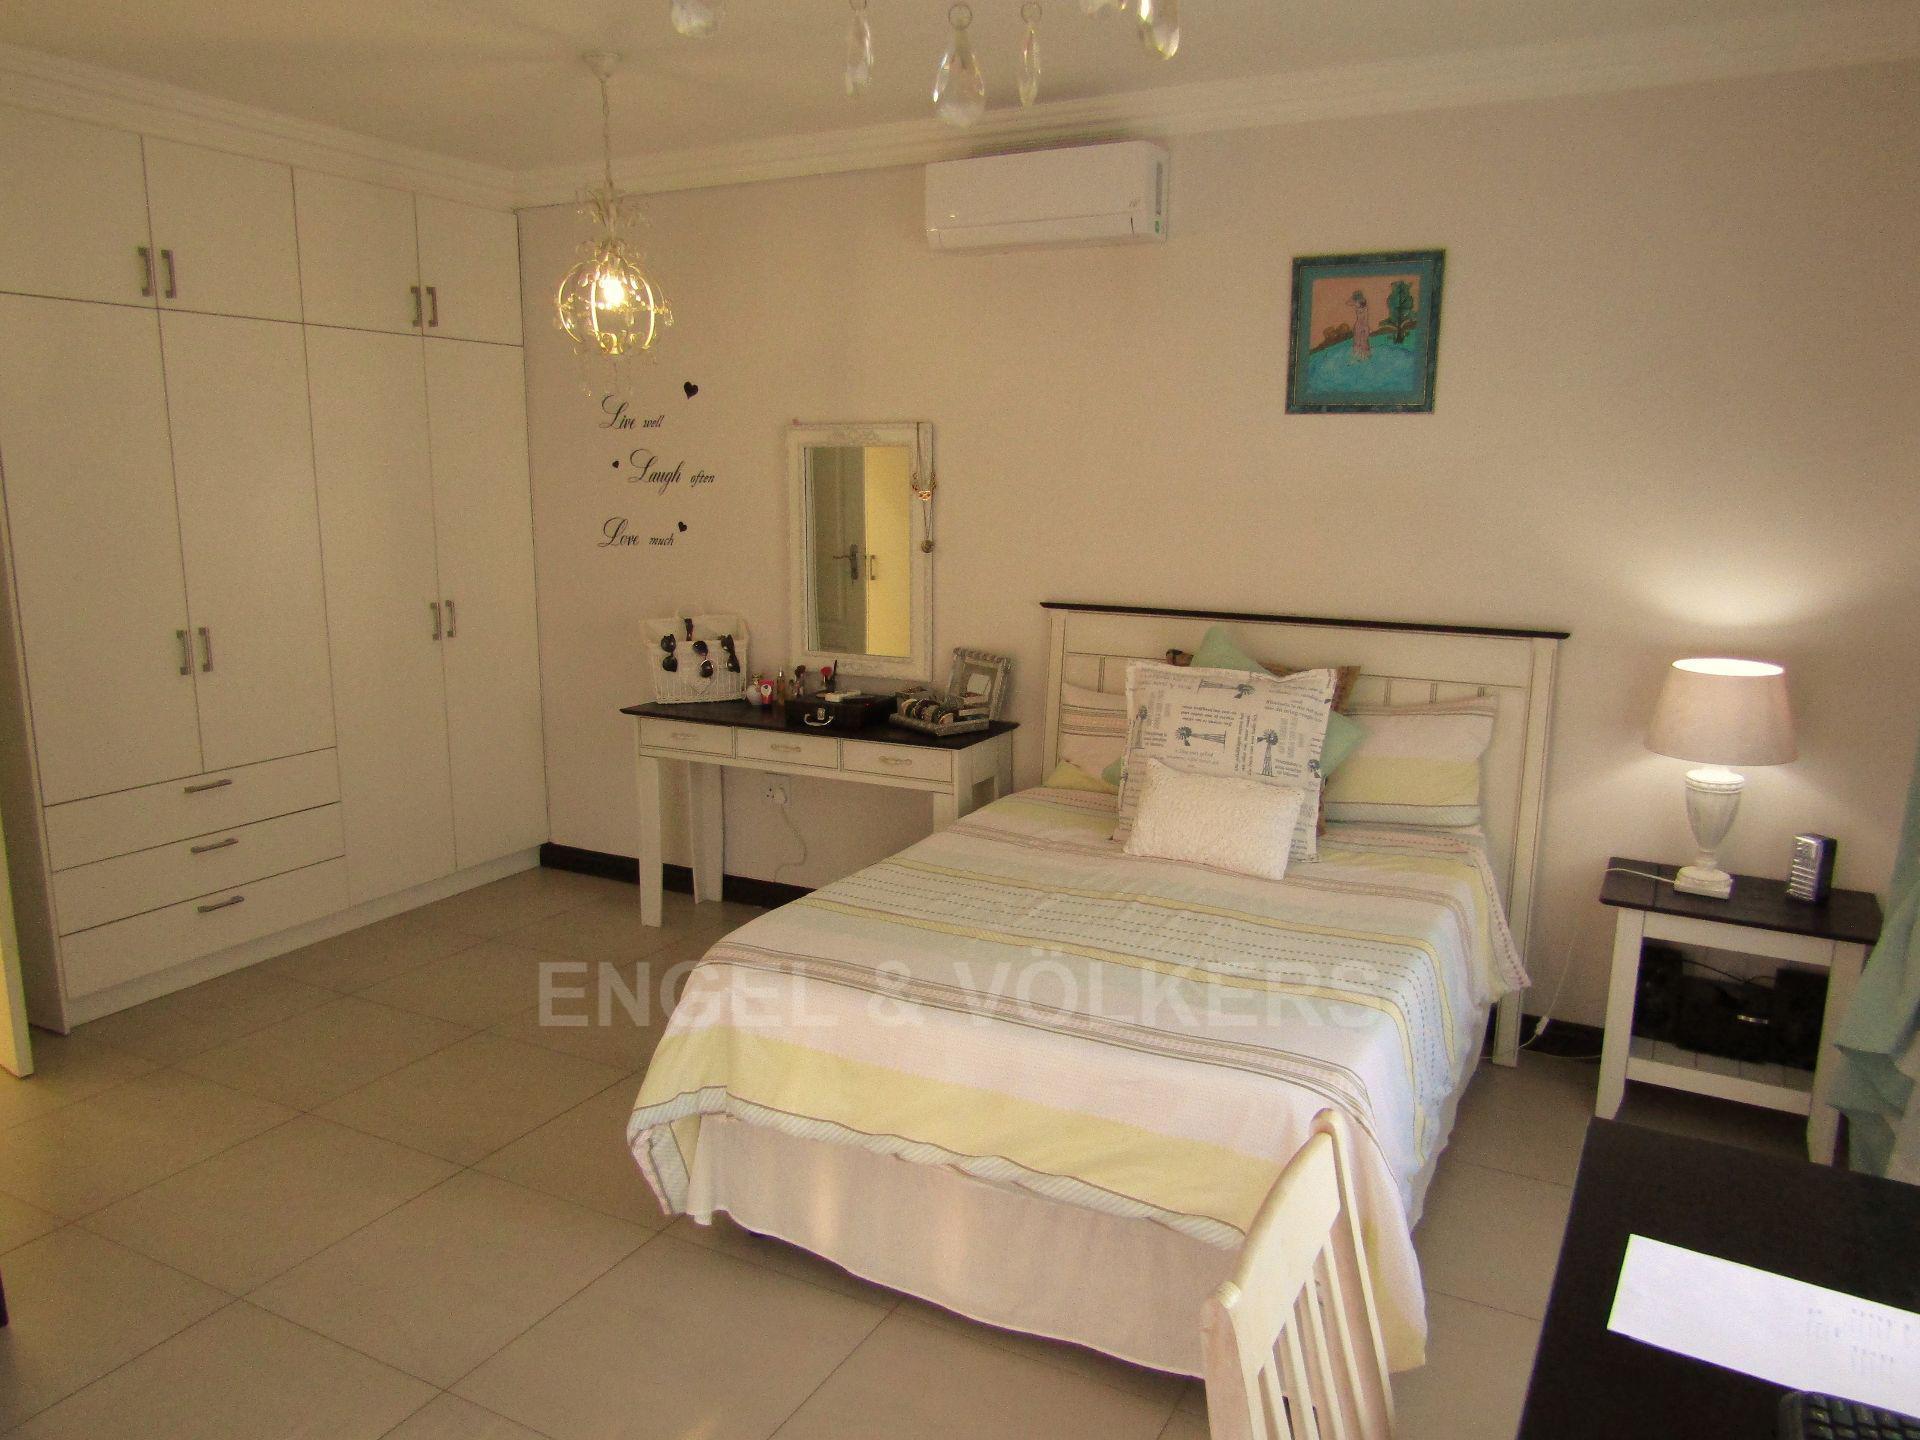 Lifestyle Estate property for sale. Ref No: 13458759. Picture no 18